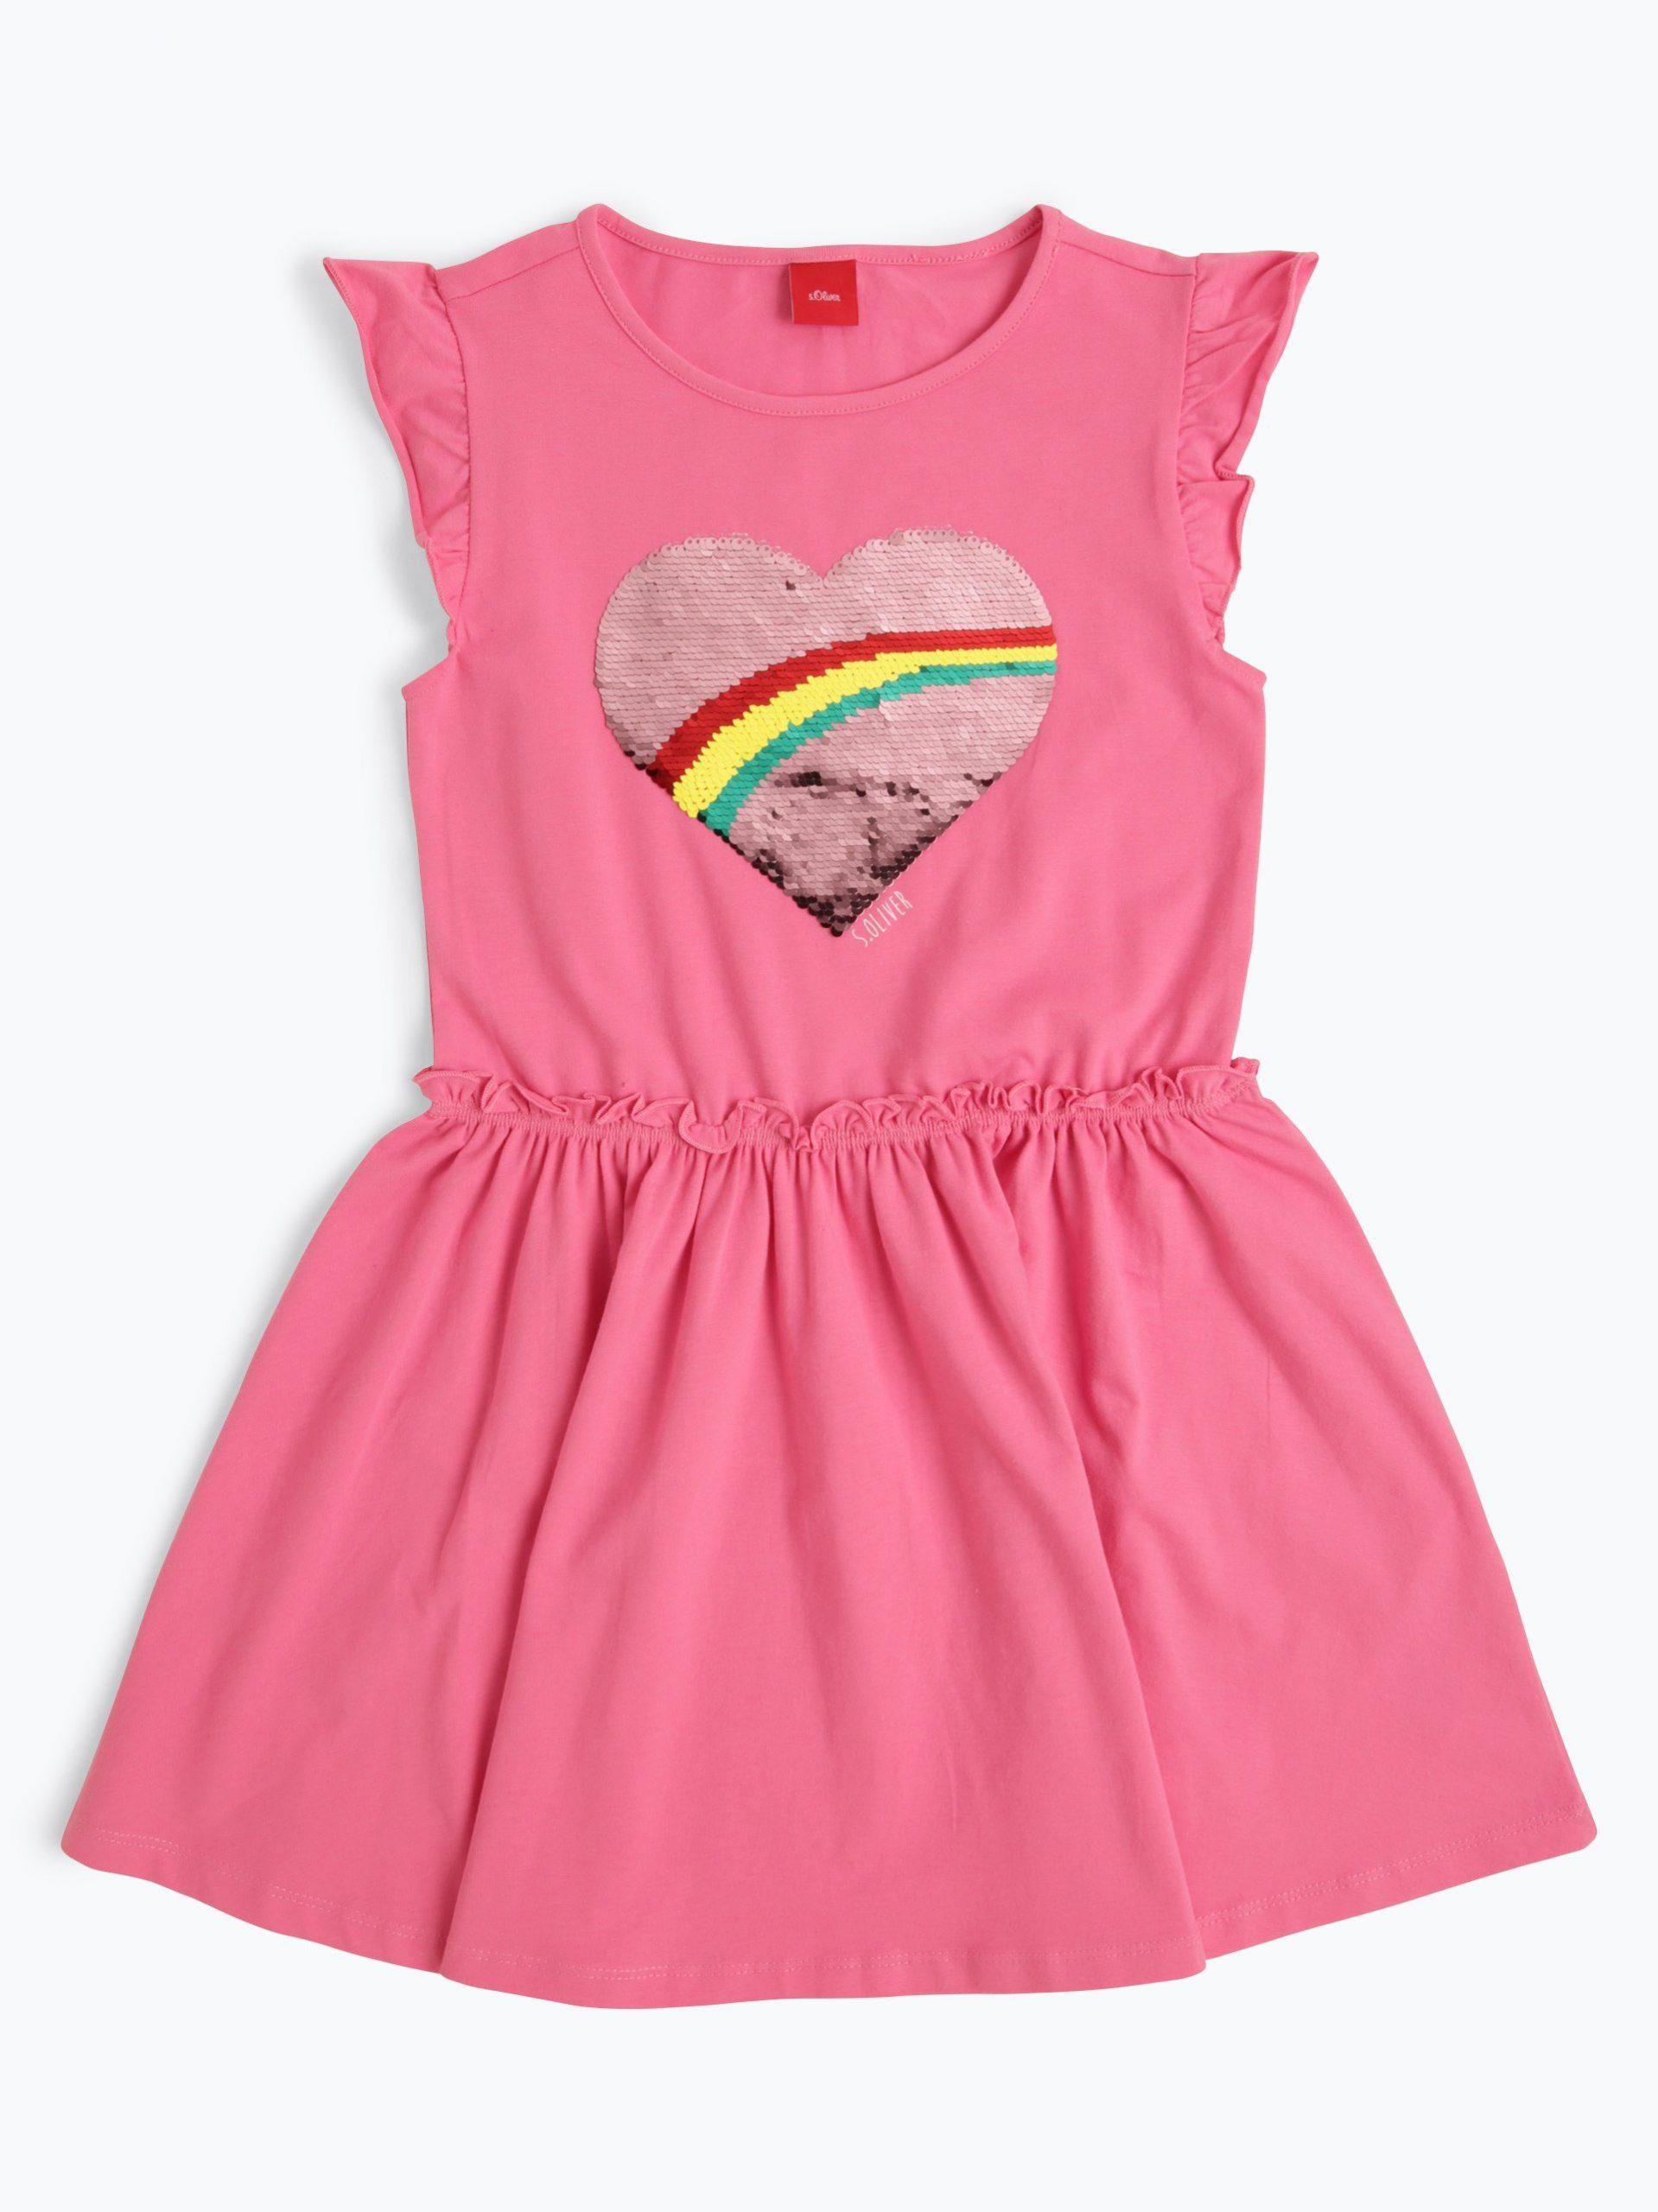 Soliver Mädchen Kleid Online Kaufen  Vangraaf